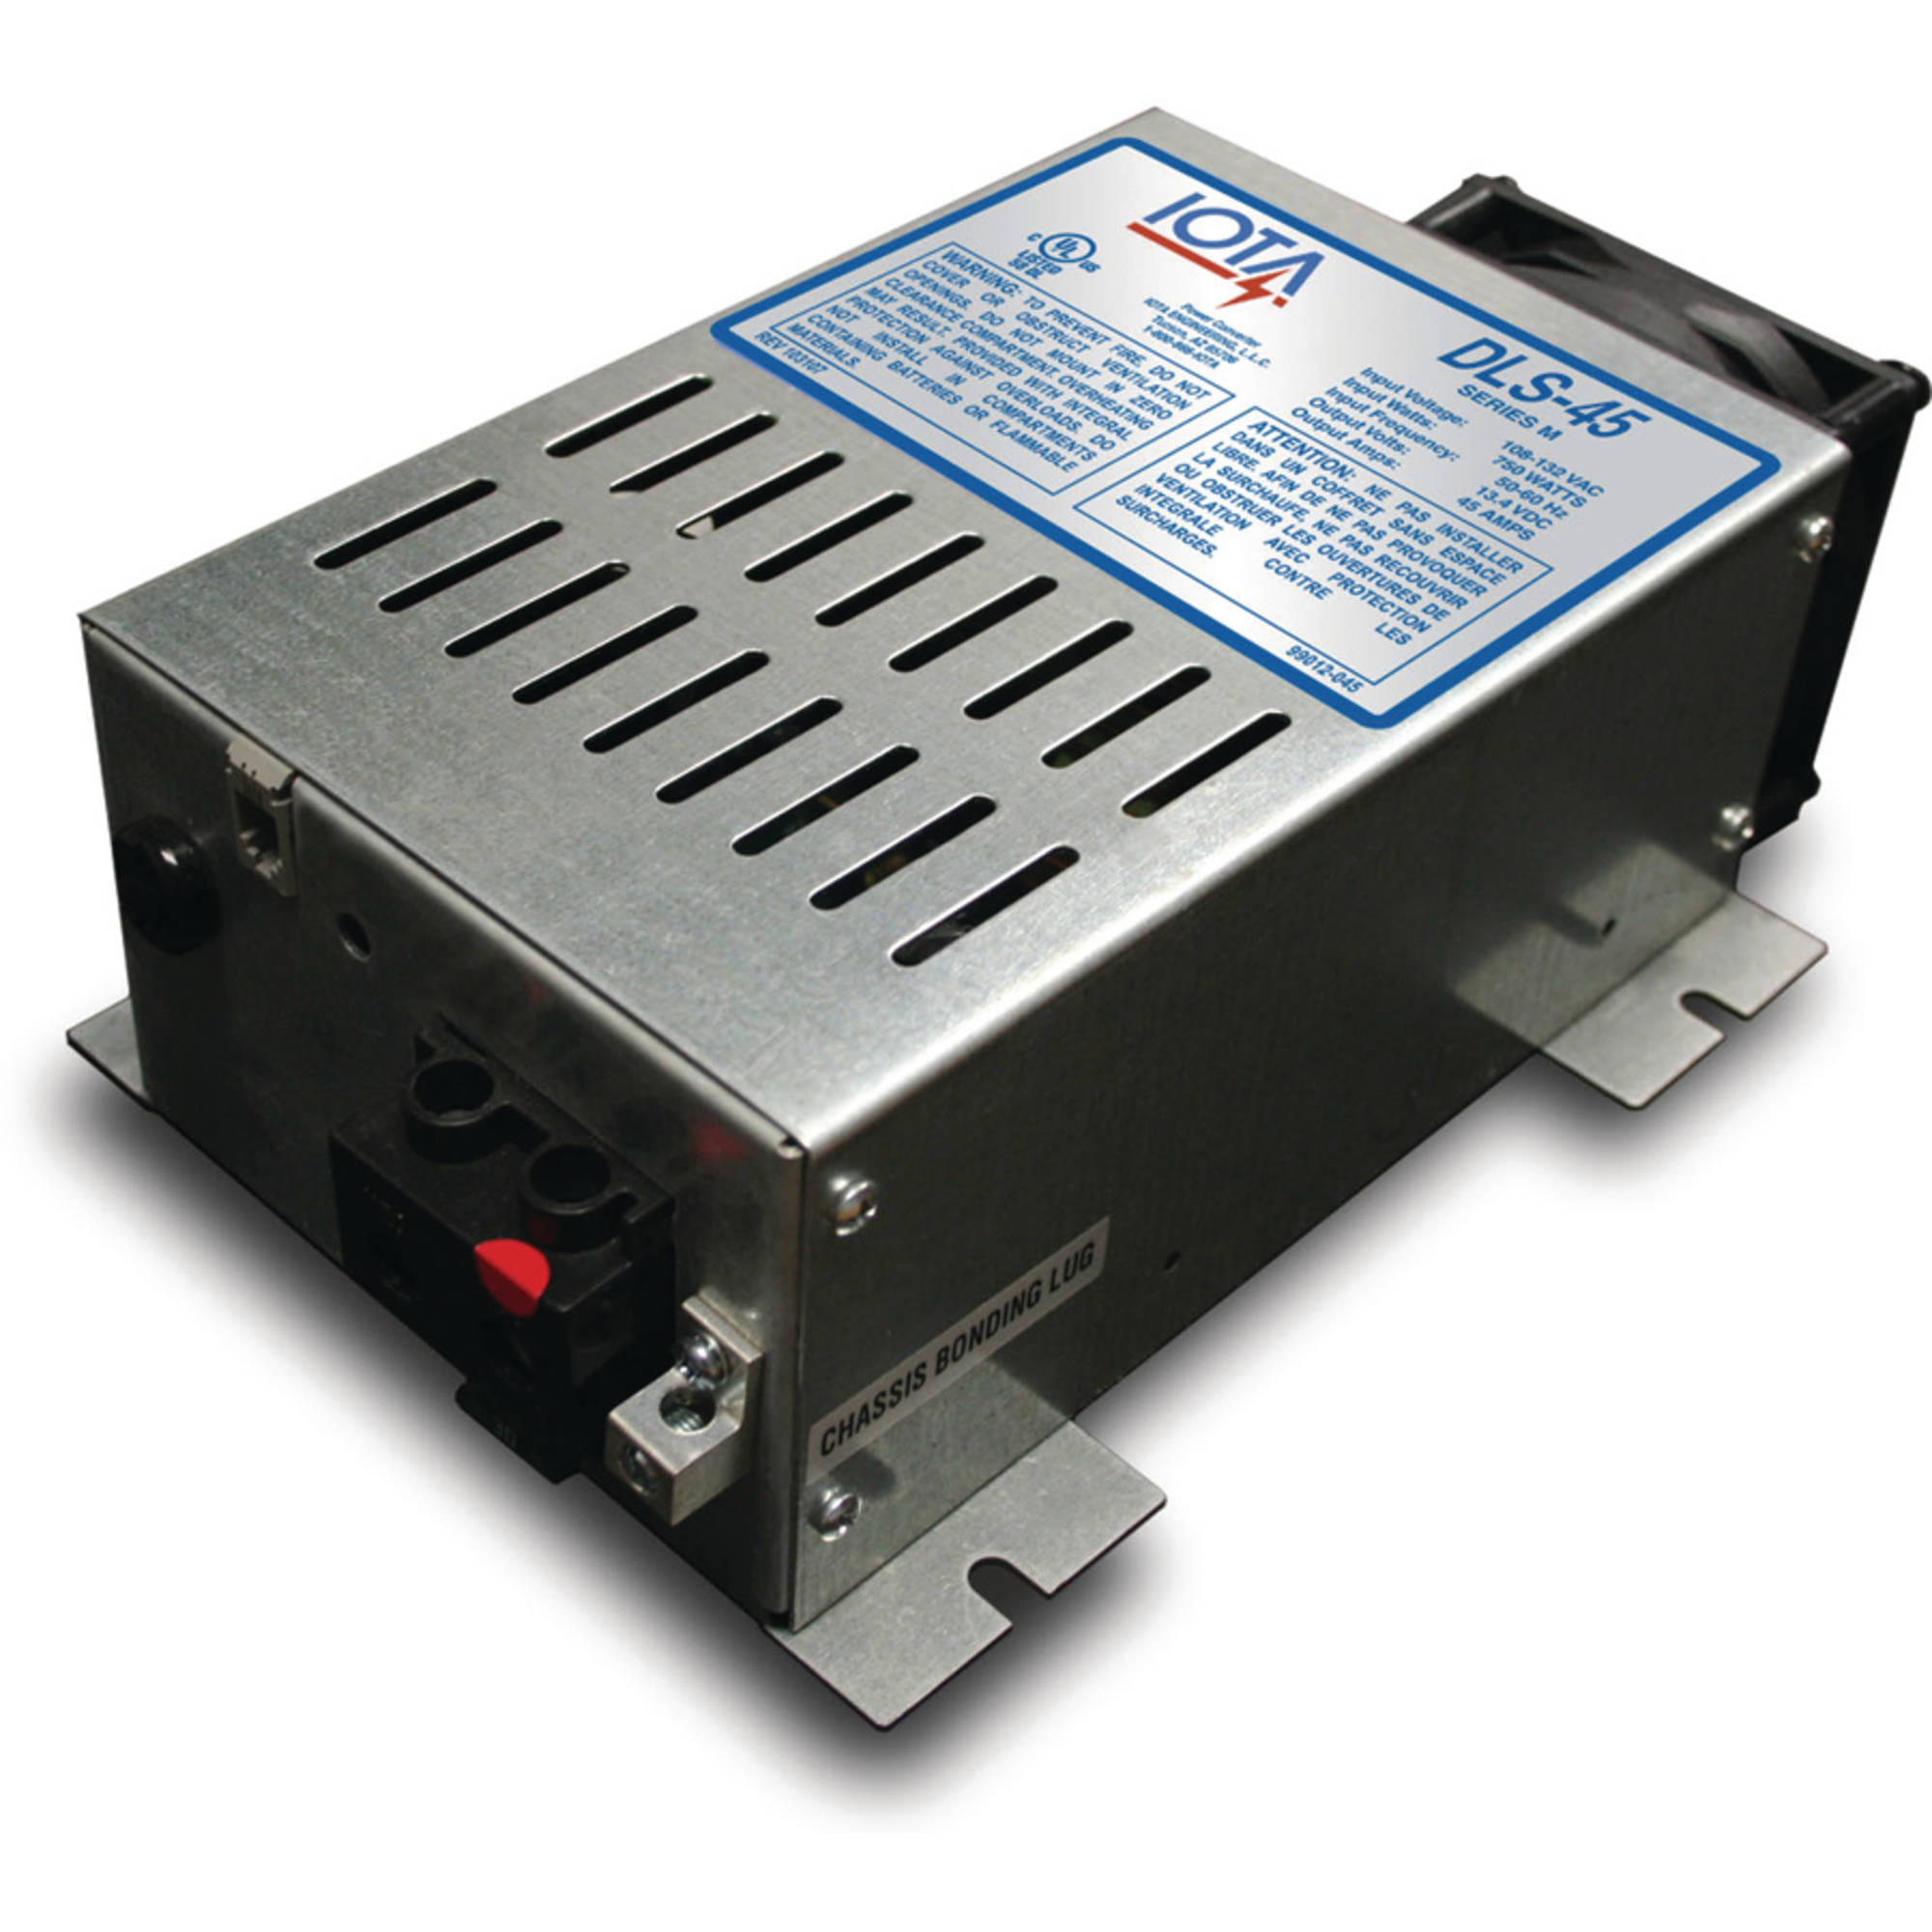 Iota DLS-45 45 Amp Power Converter Battery Charger